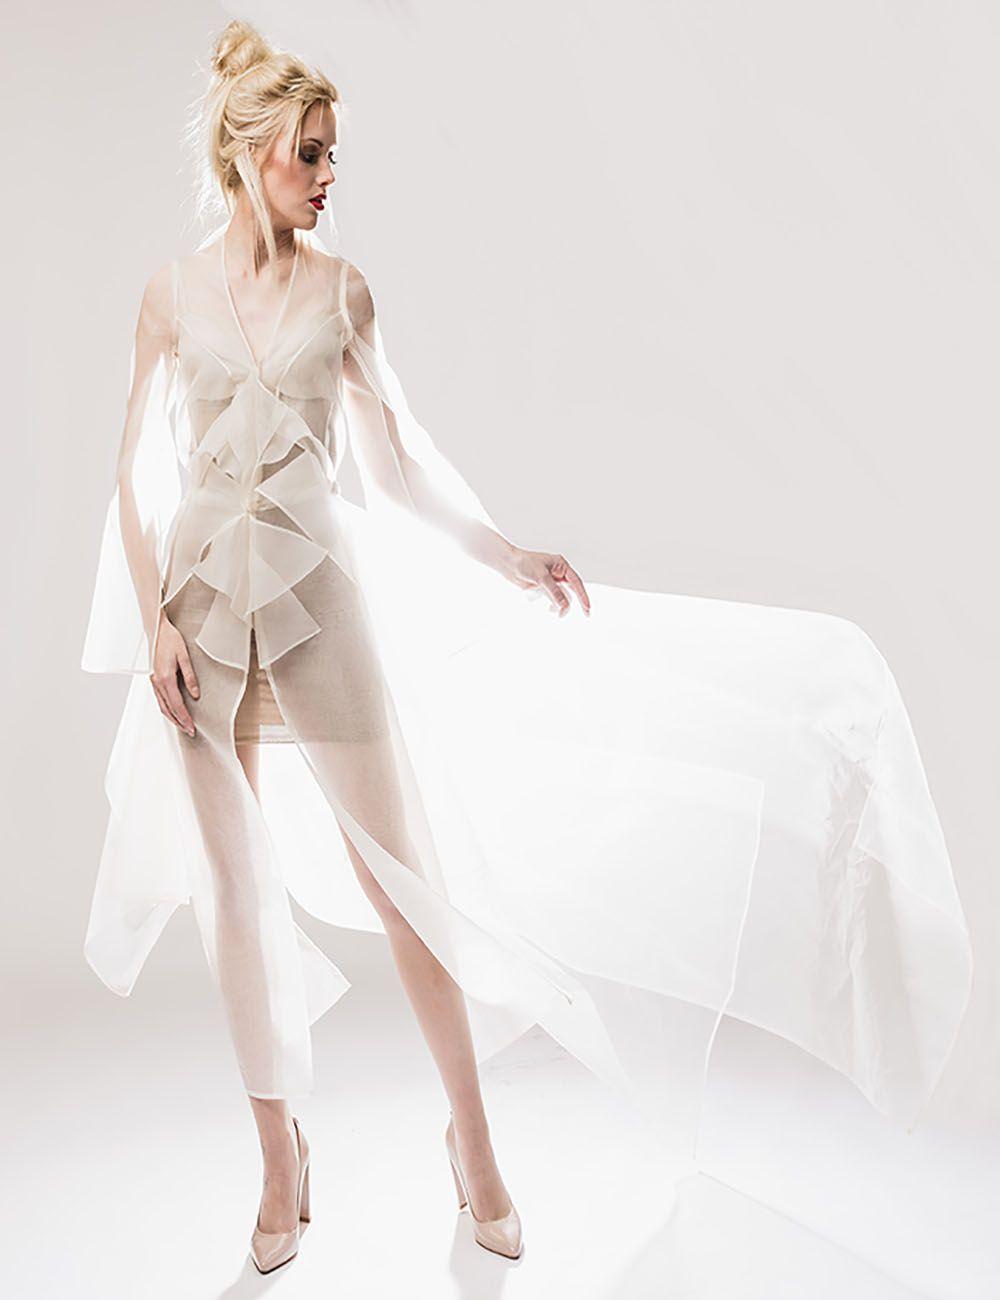 ORGANZA #Mantel #Bridal #transparent #origami #origamiinspiration #art #design